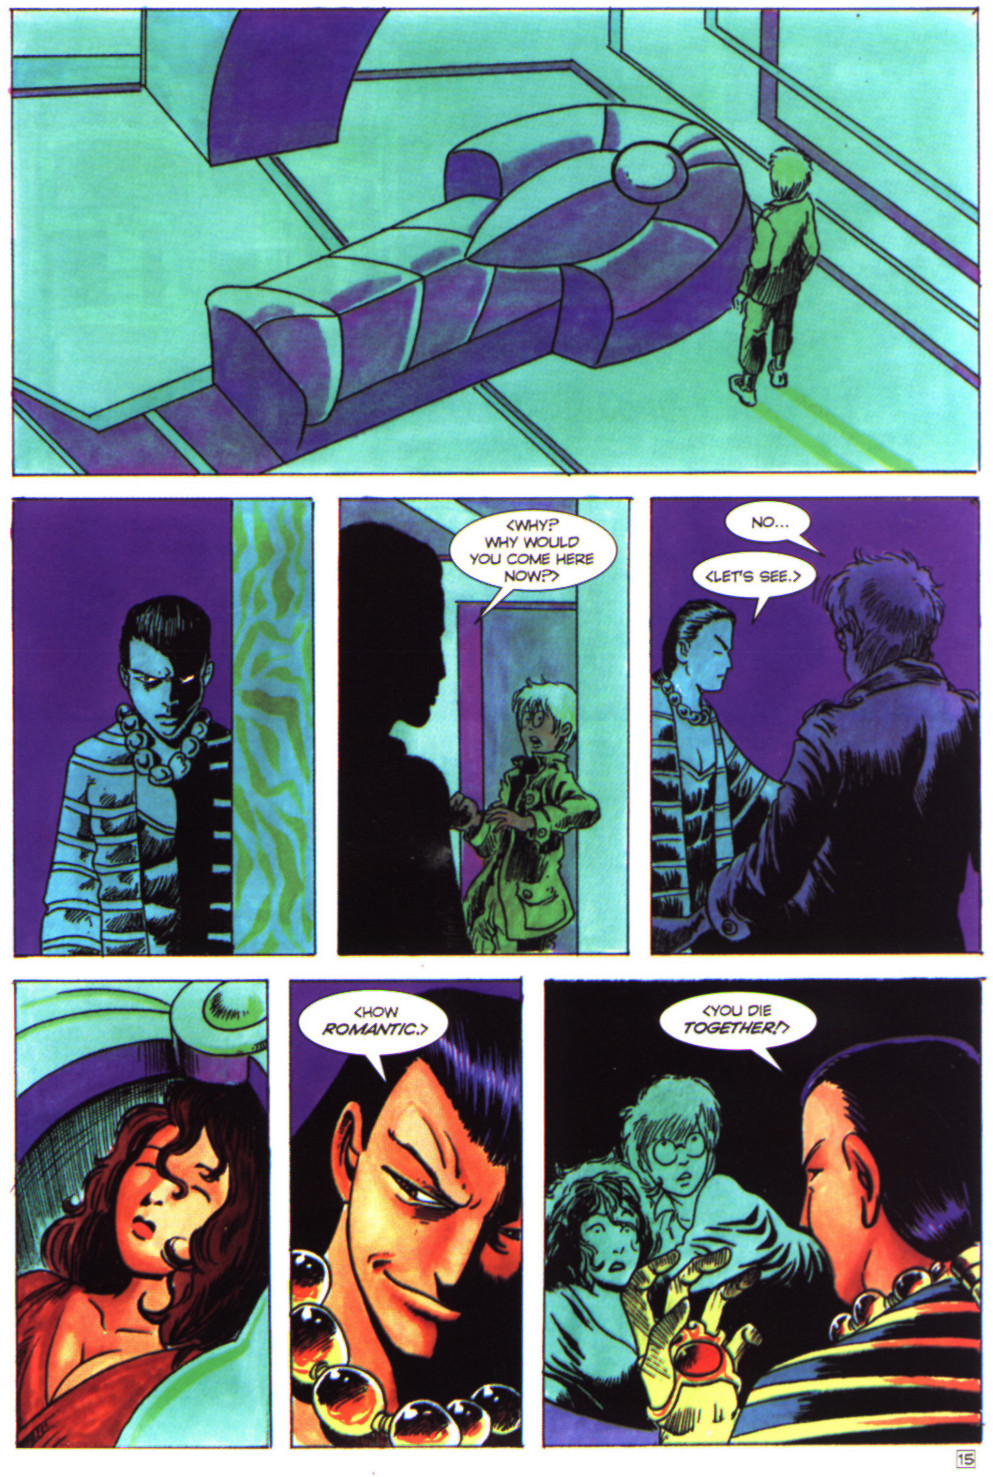 Read online Stargate comic -  Issue #4 - 17